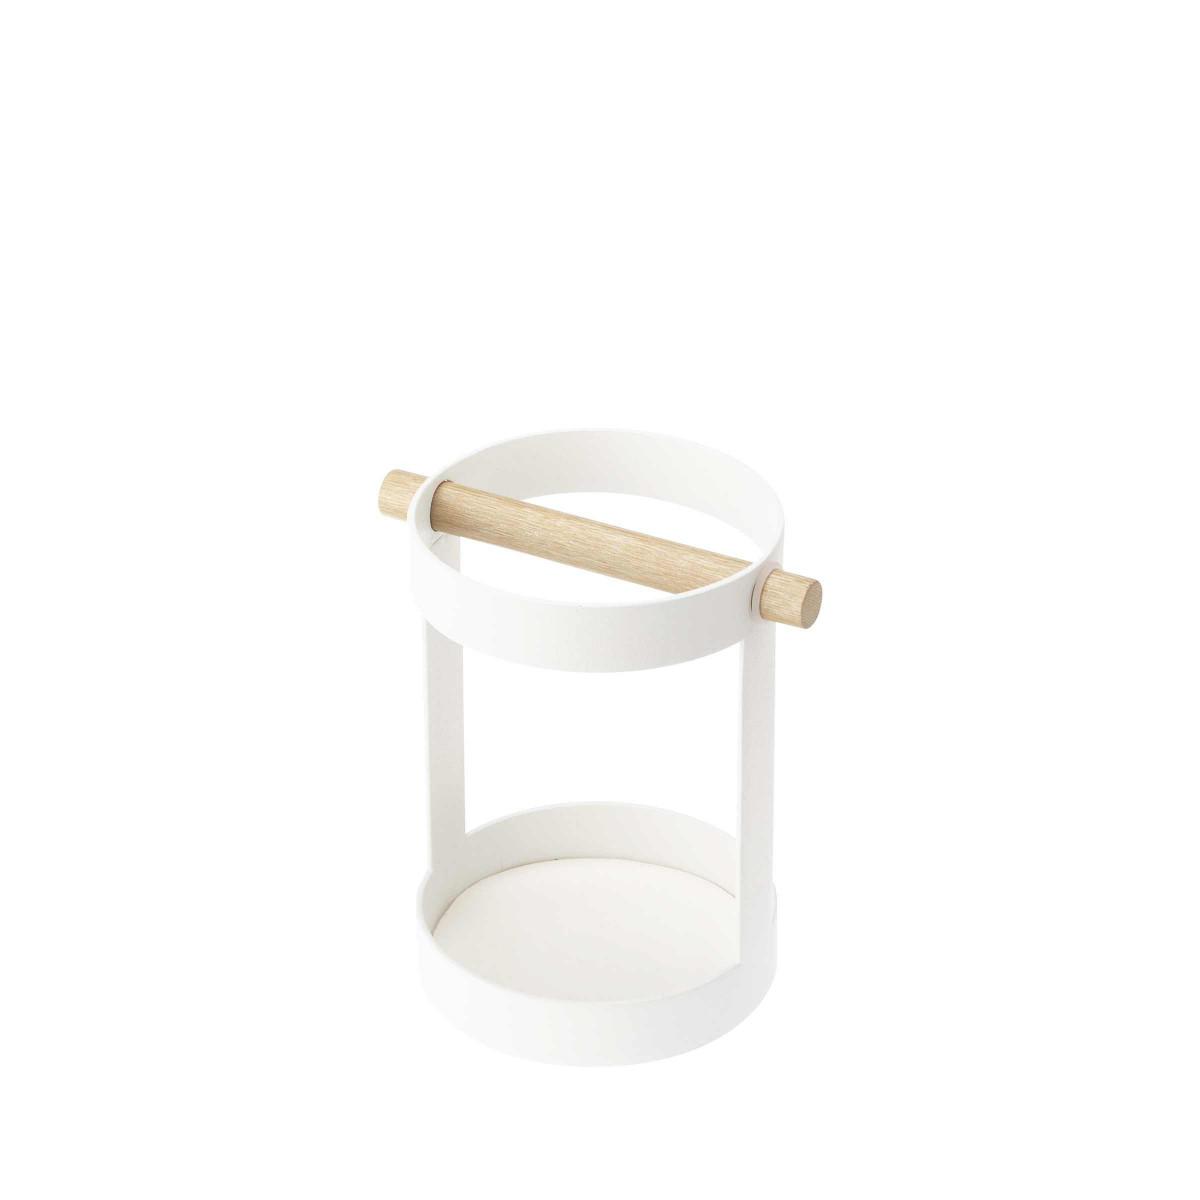 Pot ustensiles de cuisine design rangement - Pot a ustensiles cuisine ...